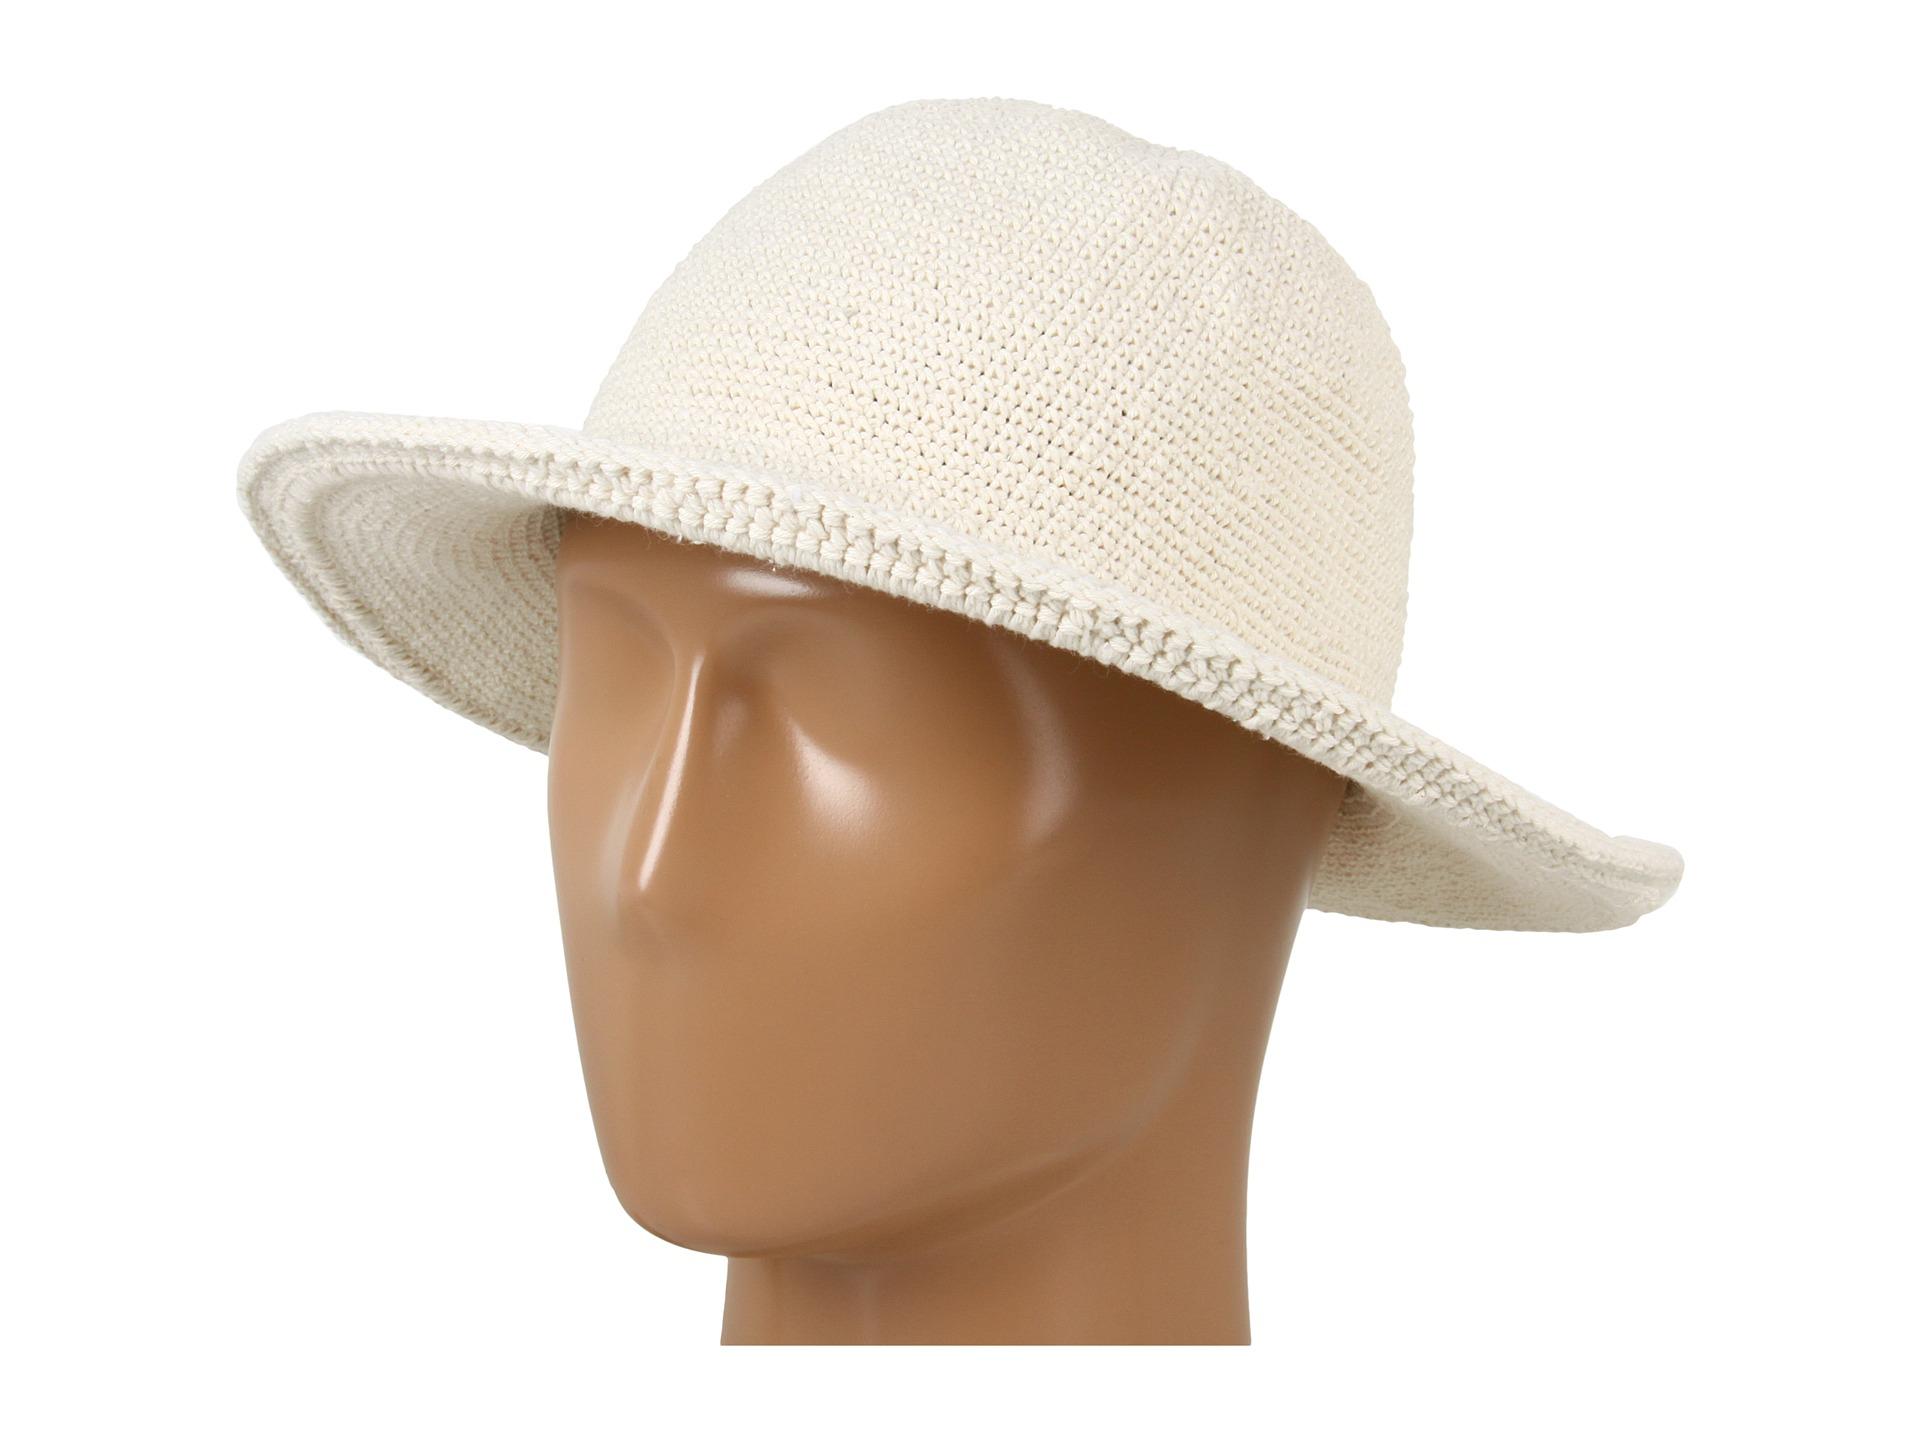 d6d008738bc Lyst - San Diego Hat Company Chm5 Cotton Crochet Medium Brim Sun Hat ...